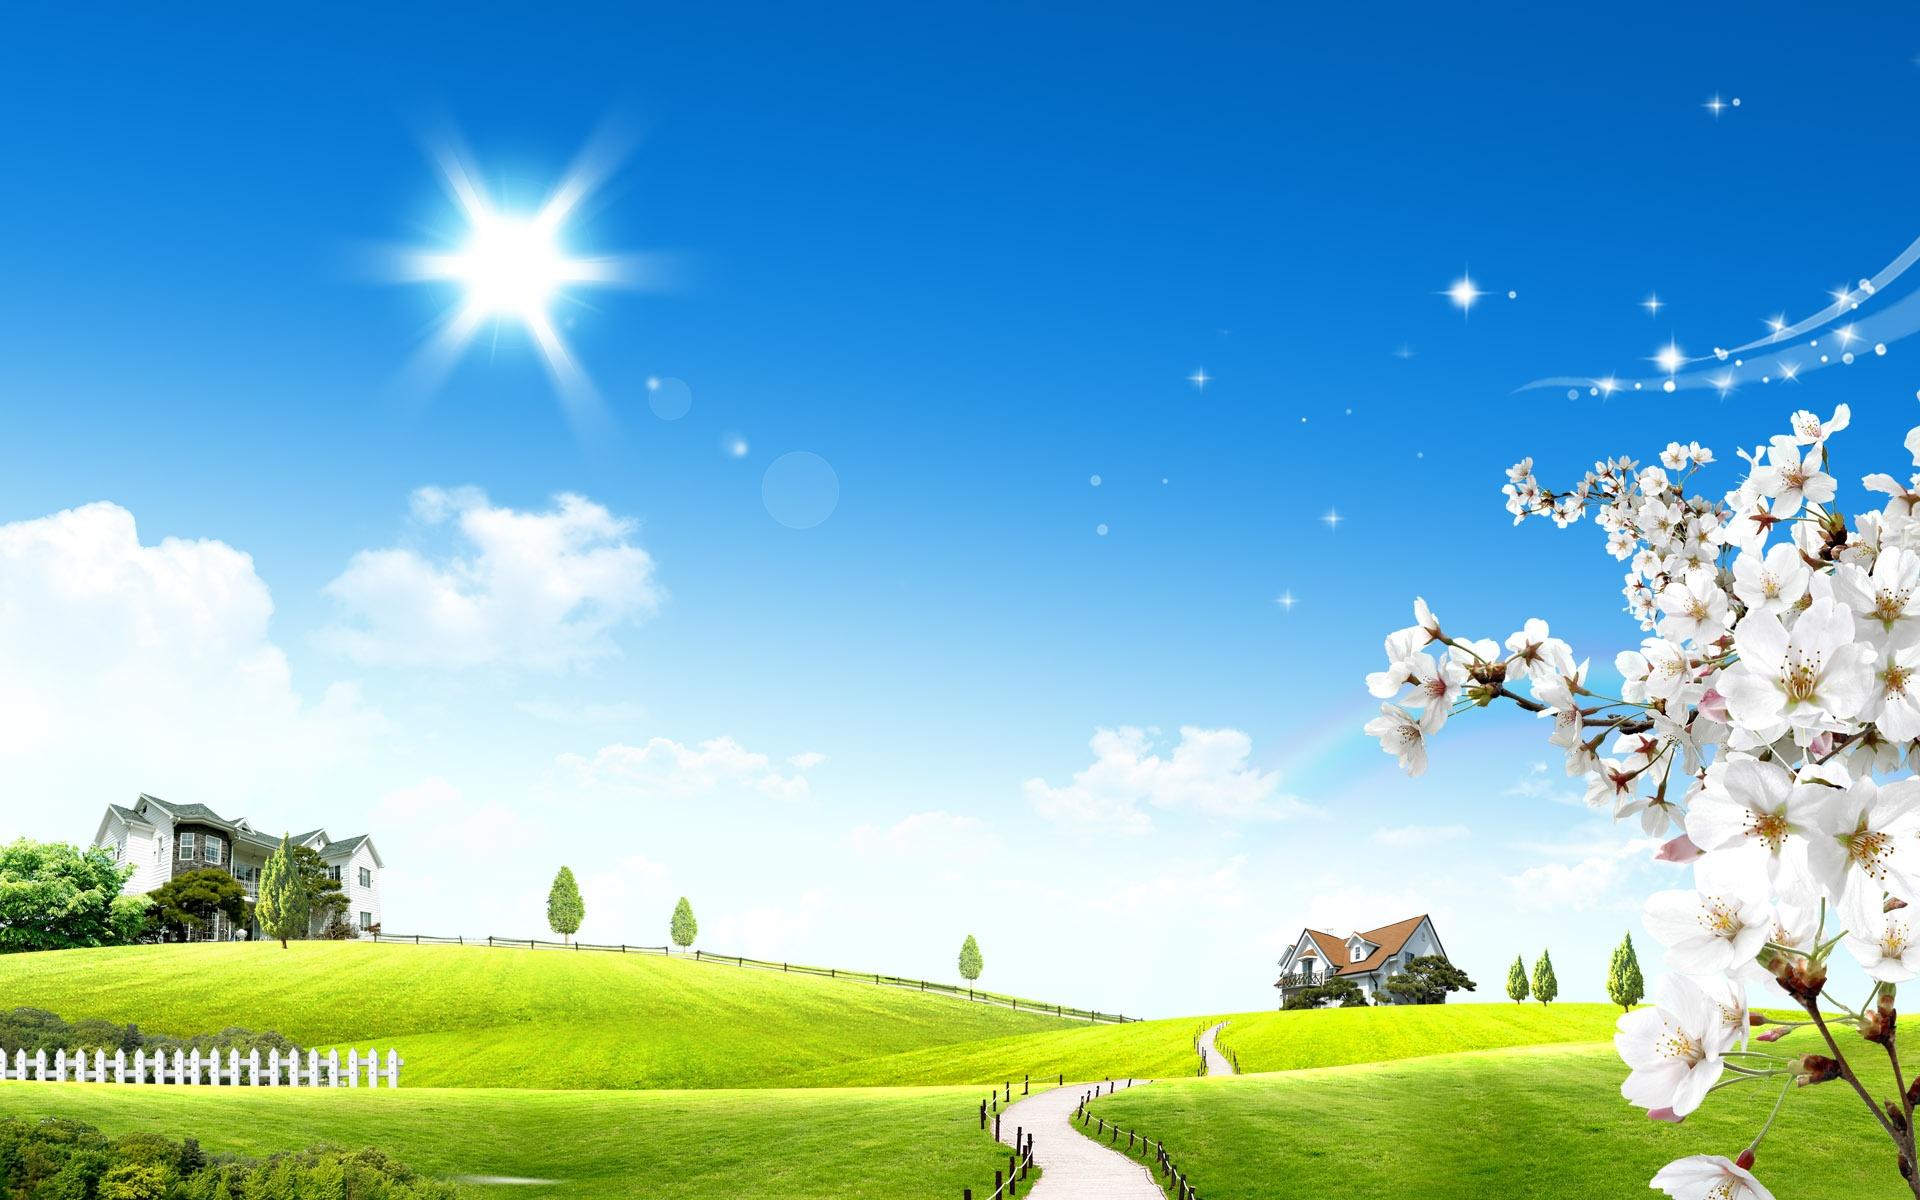 Bright Sunny Wallpaper - WallpaperSafari